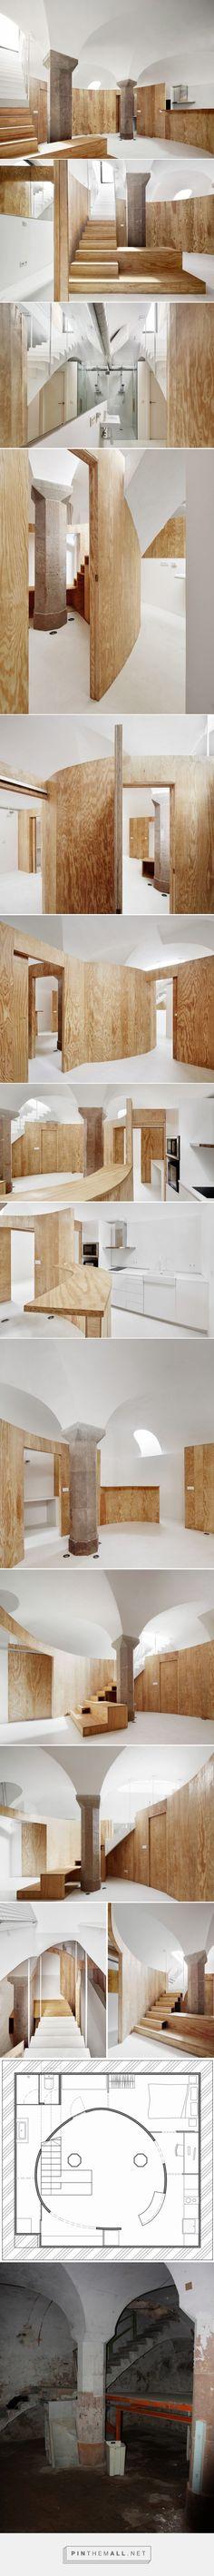 RAS architecture apartment tibbaut barcelona - created via http://pinthemall.net